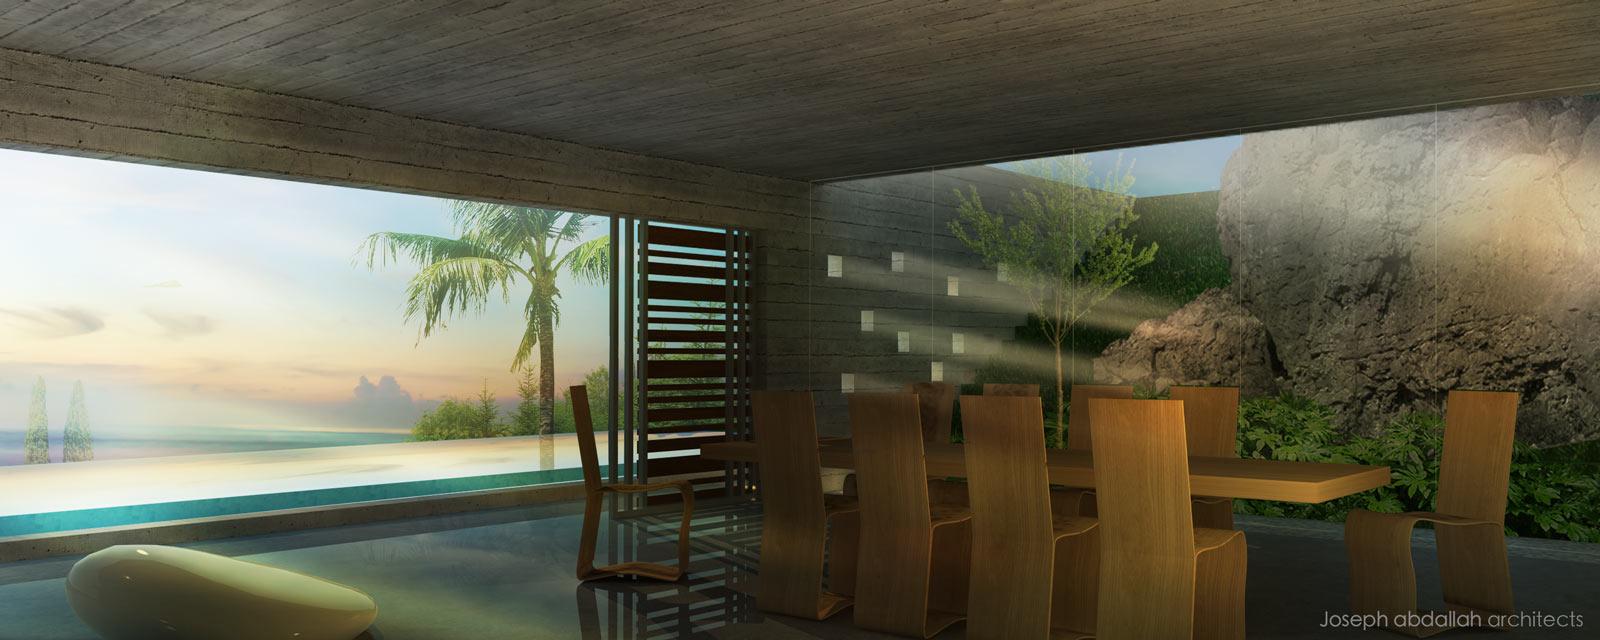 nassif-water-mirror-villa-lebanon-joseph-abdallah-architects-7